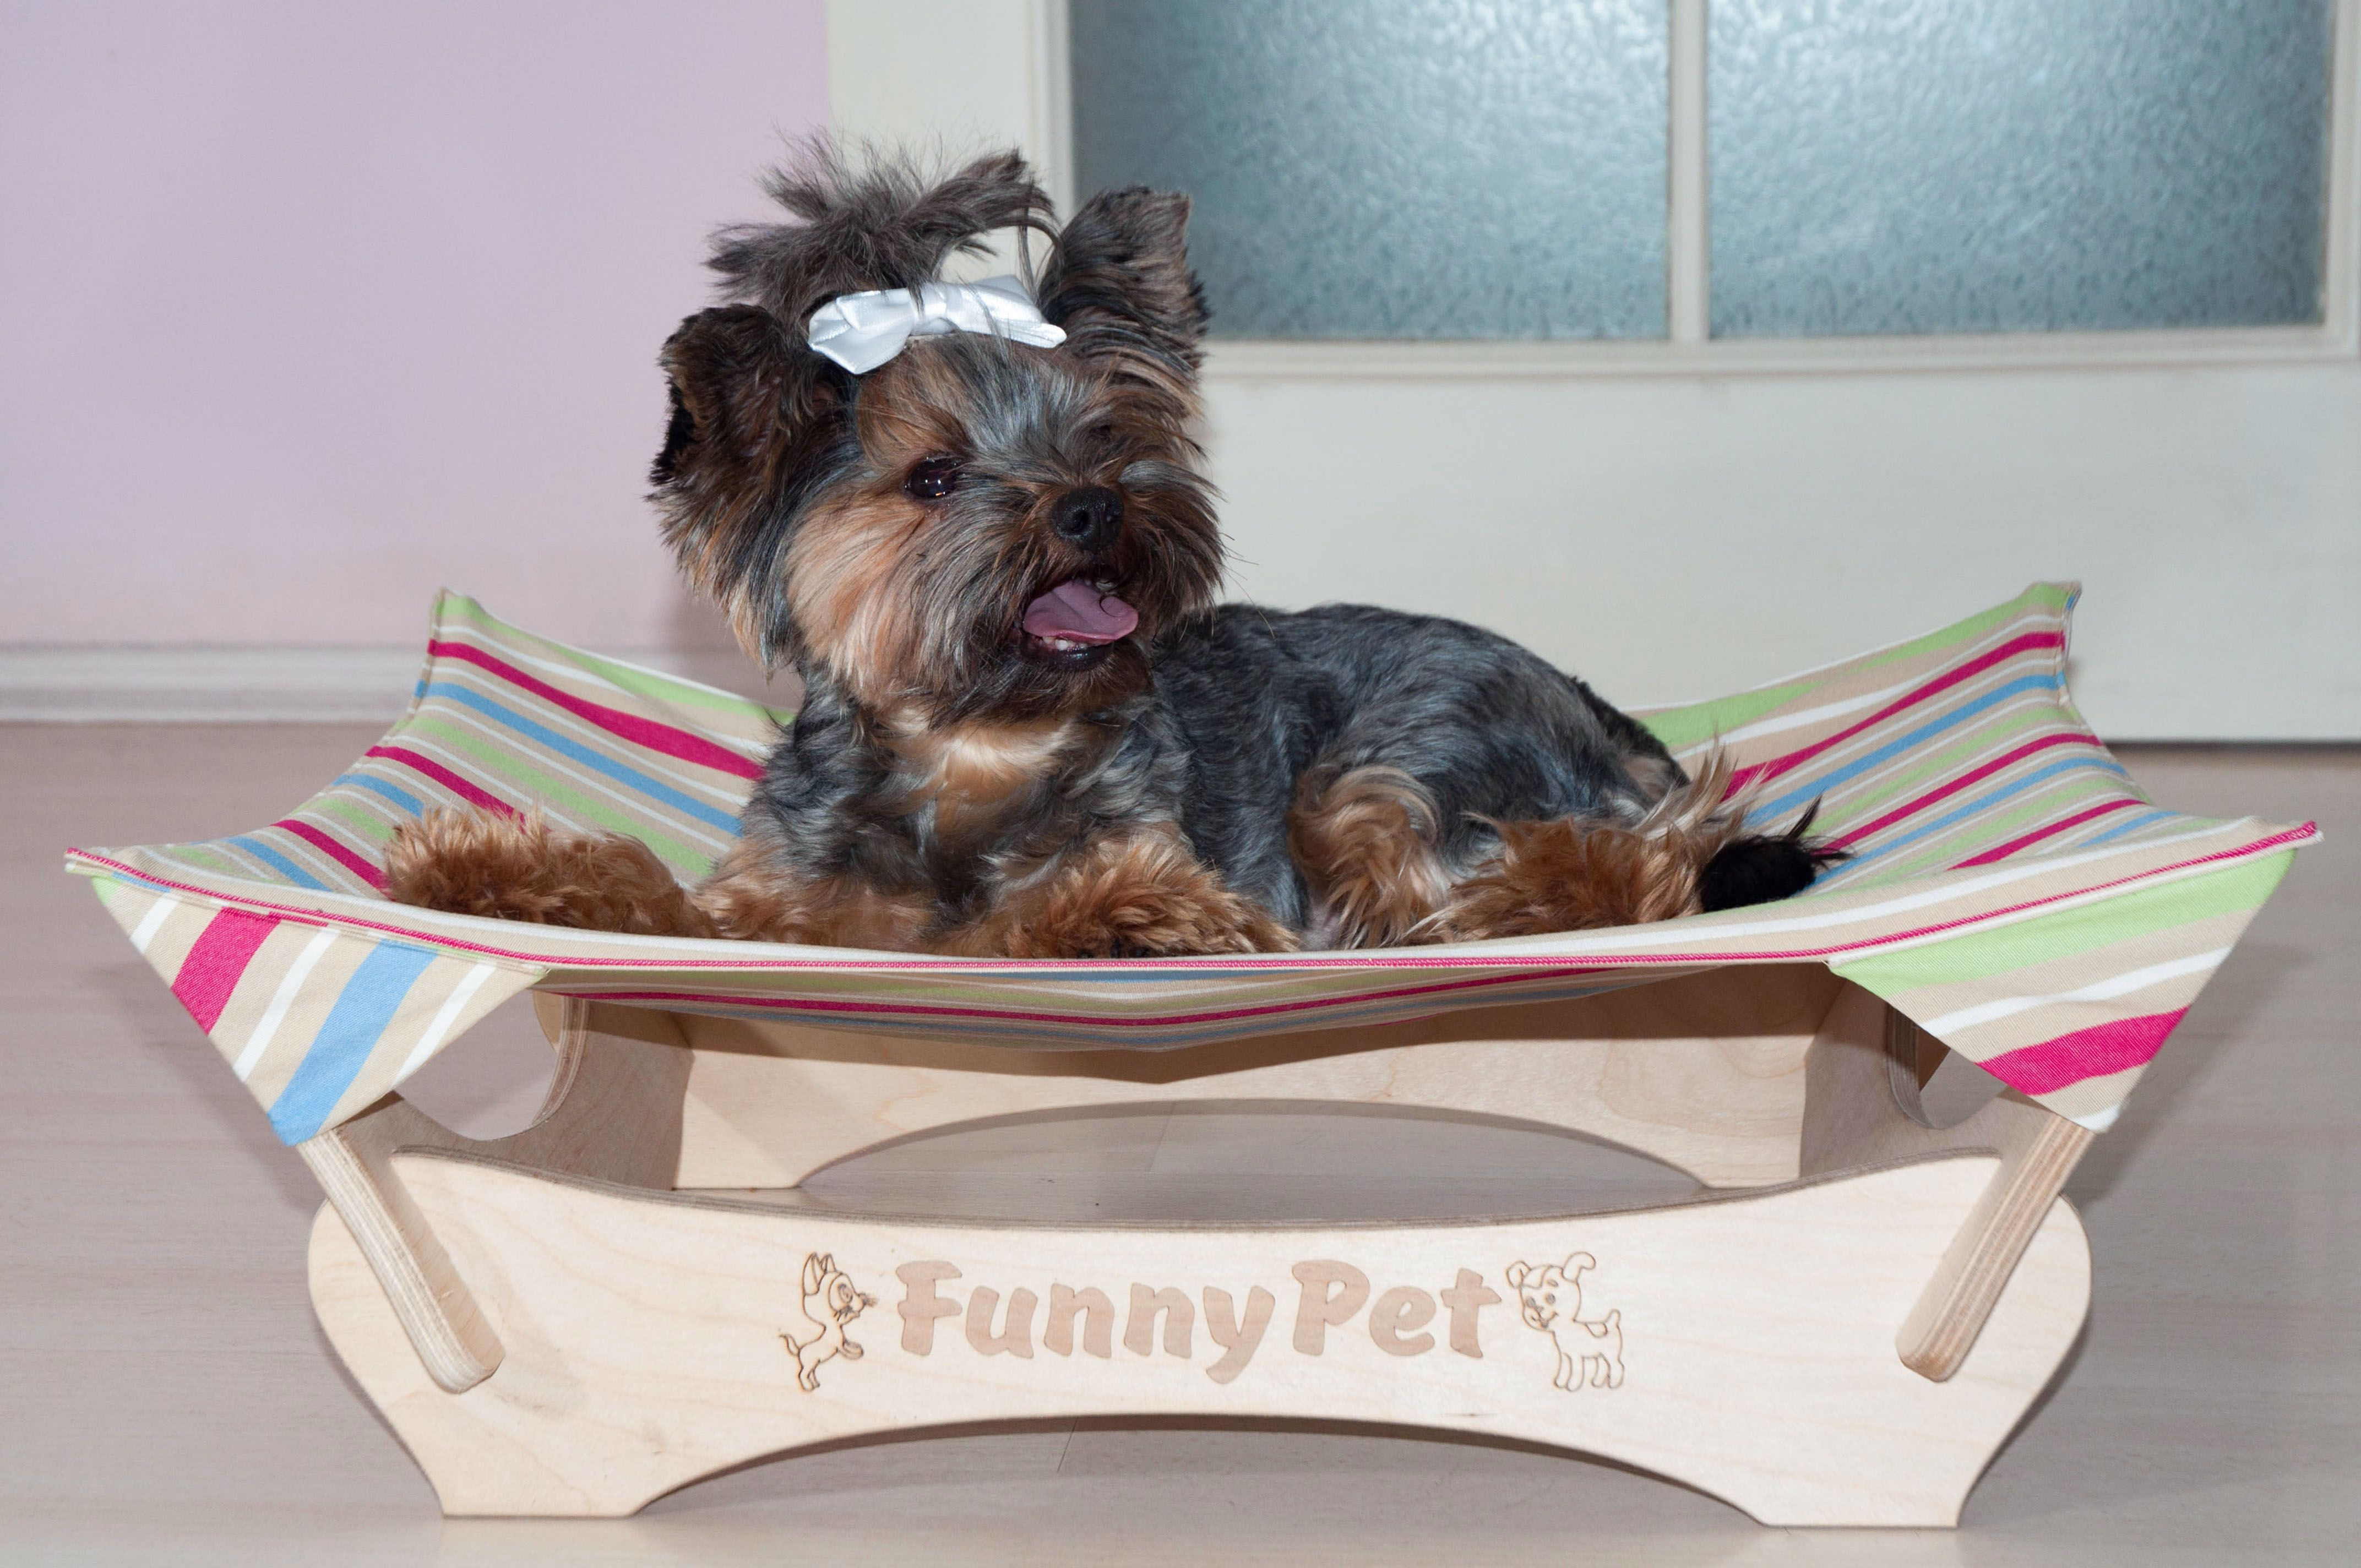 cover product tan hammocks shop petco kurgo dog car heather en hammock petcostore seat center